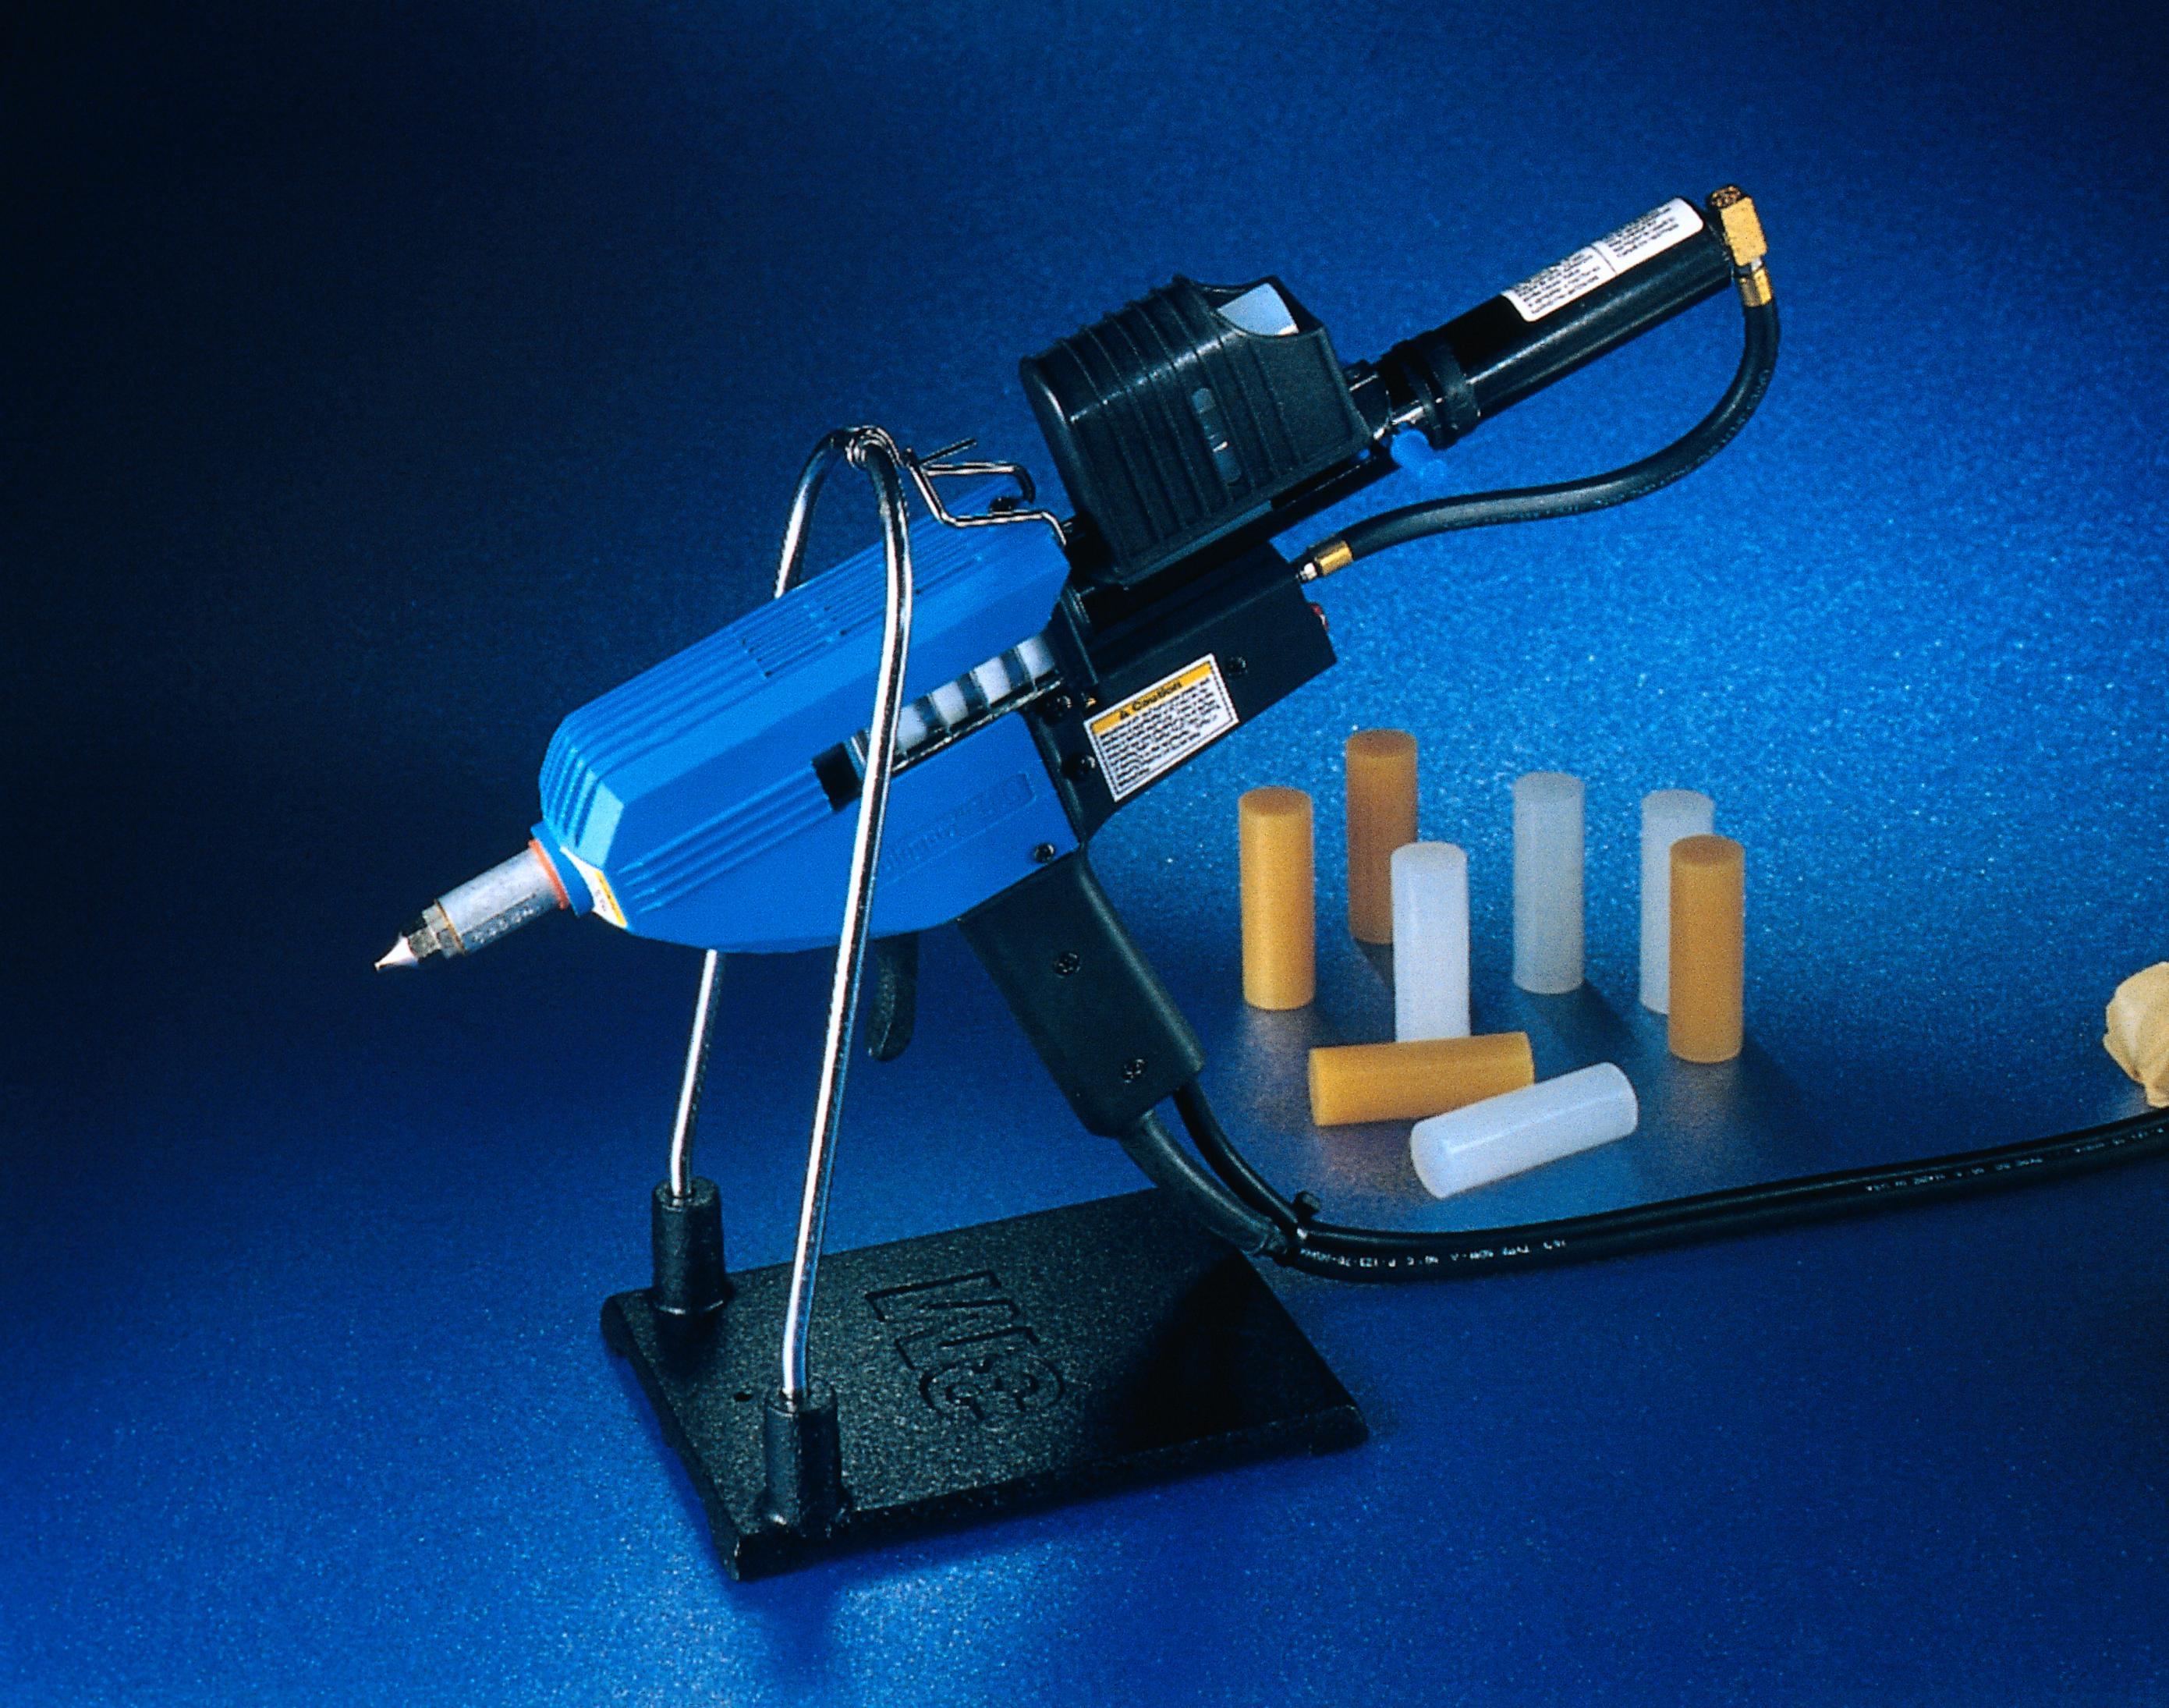 PolyIILT 3M(TM) Scotch-Weld(TM) Hot Melt Applicator PG II LT